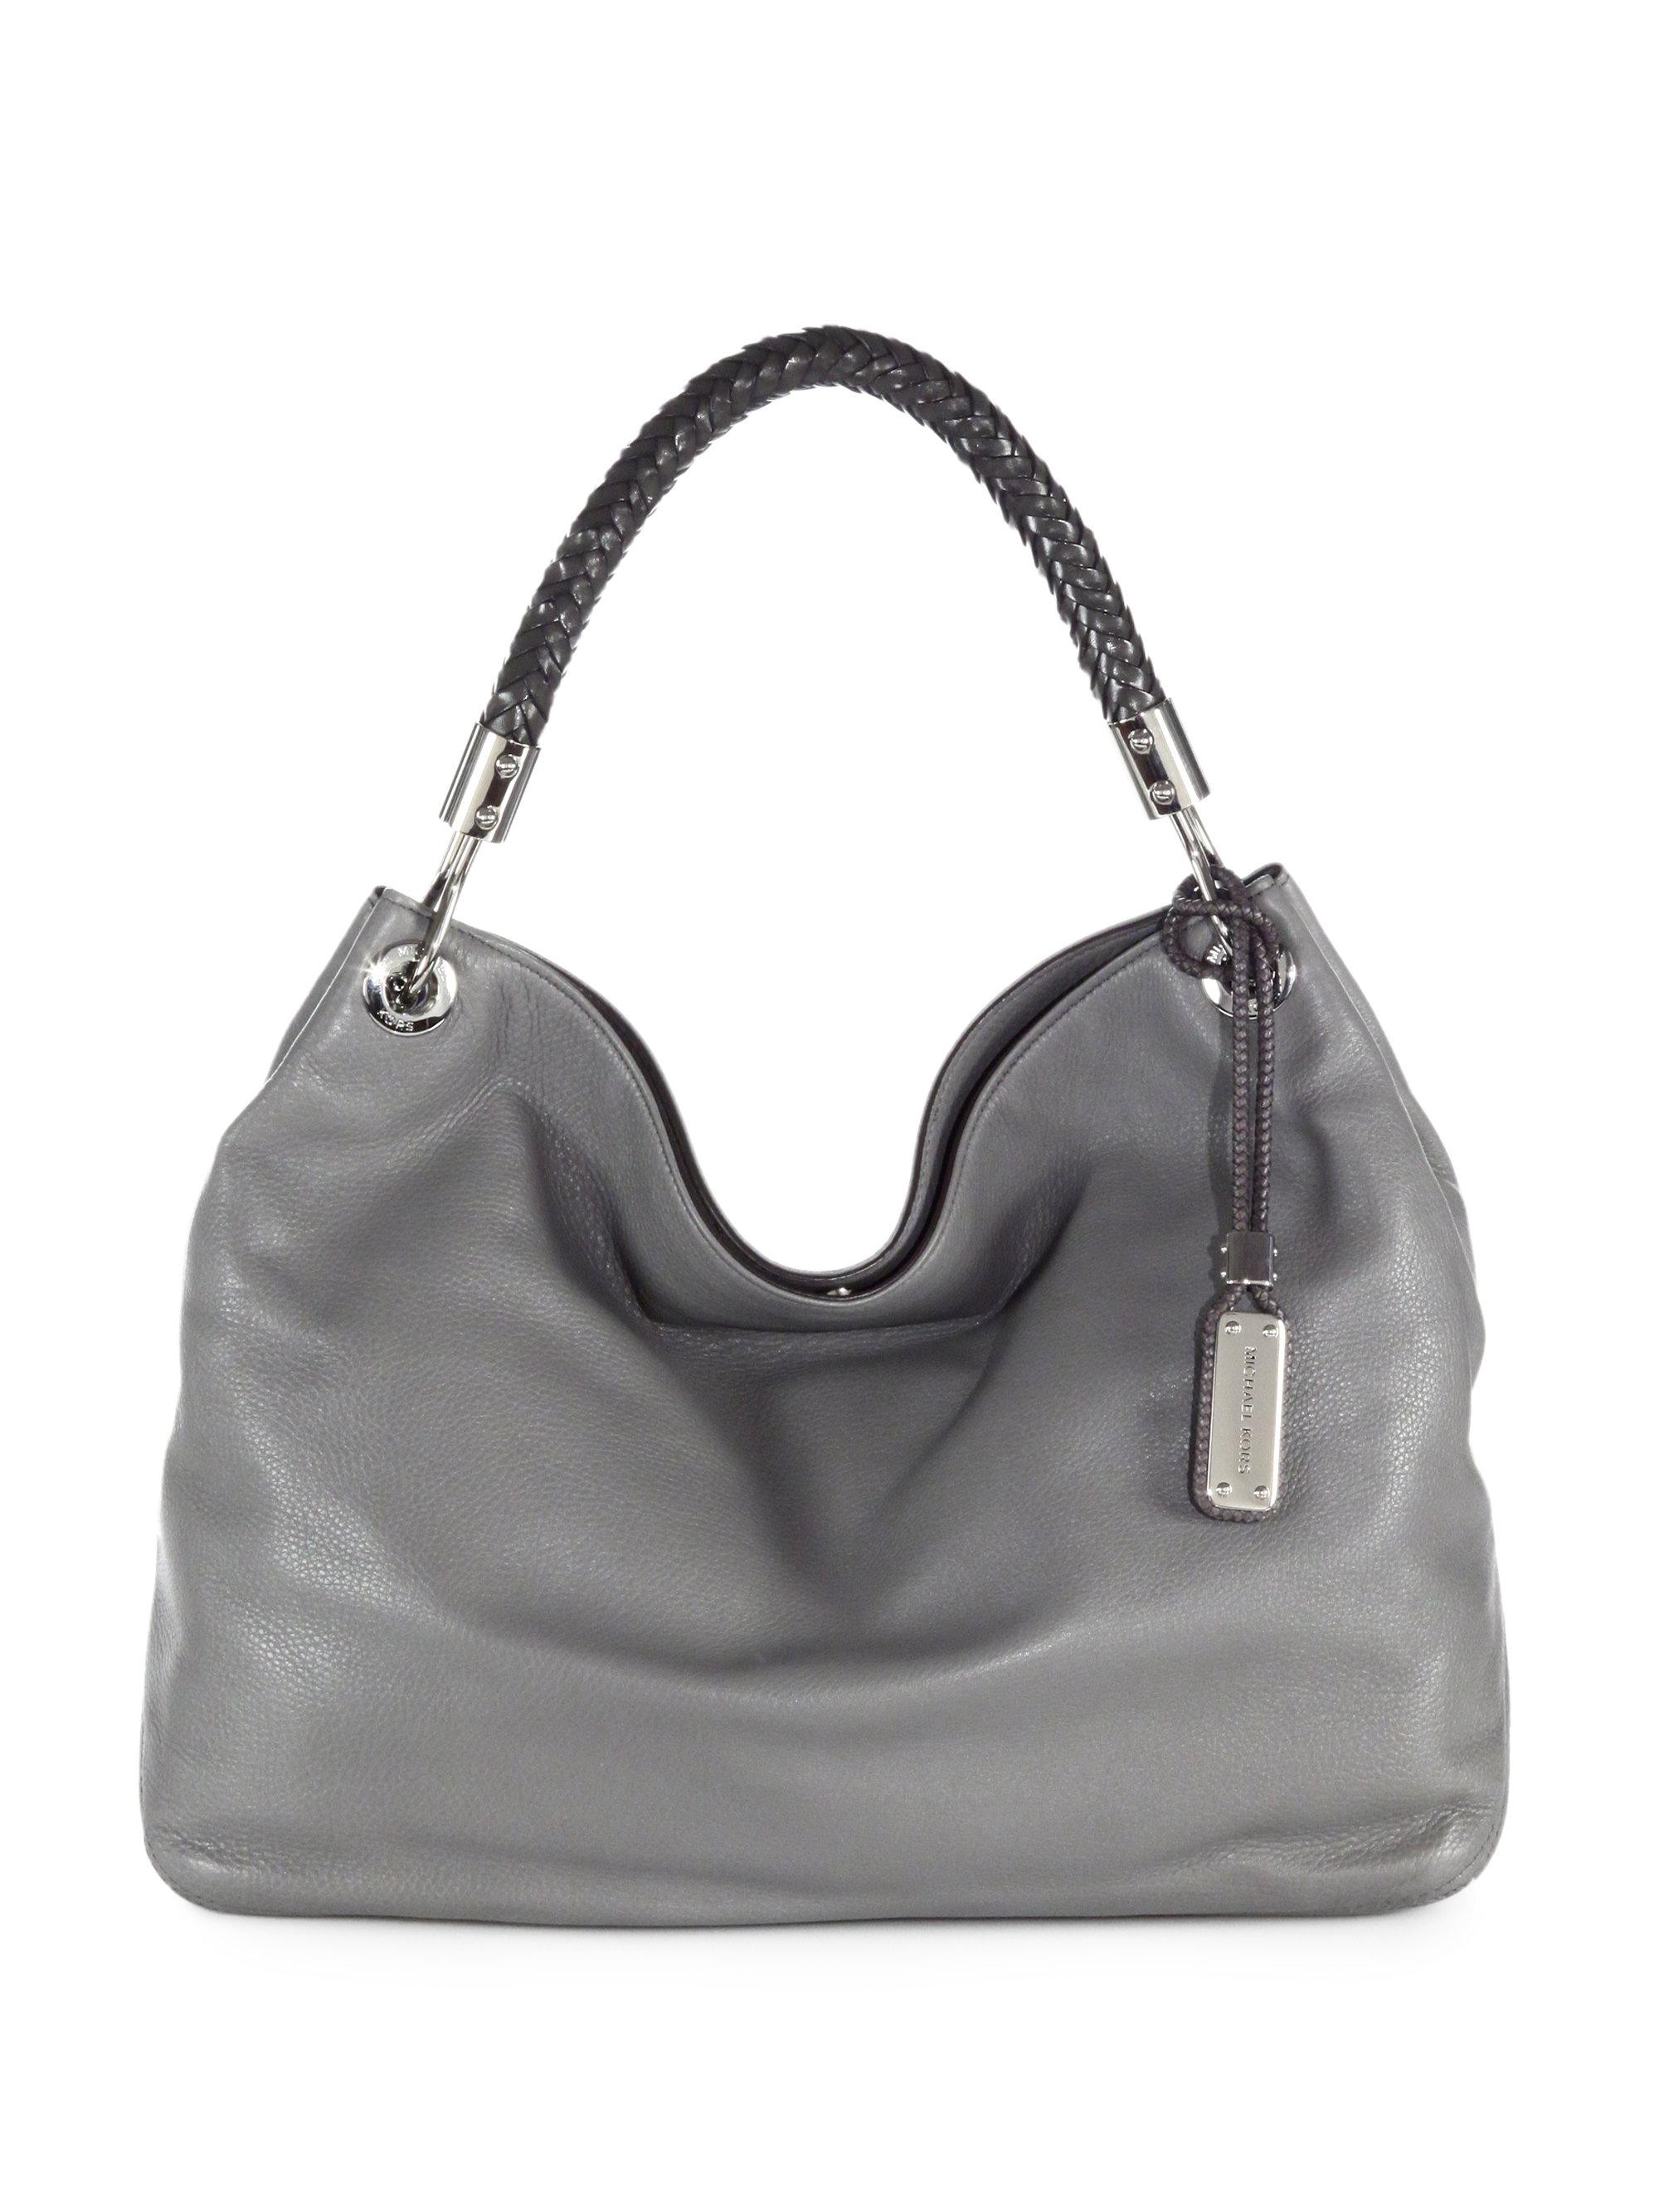 Michael kors Skorpios Leather Shoulder Bag in Gray | Lyst